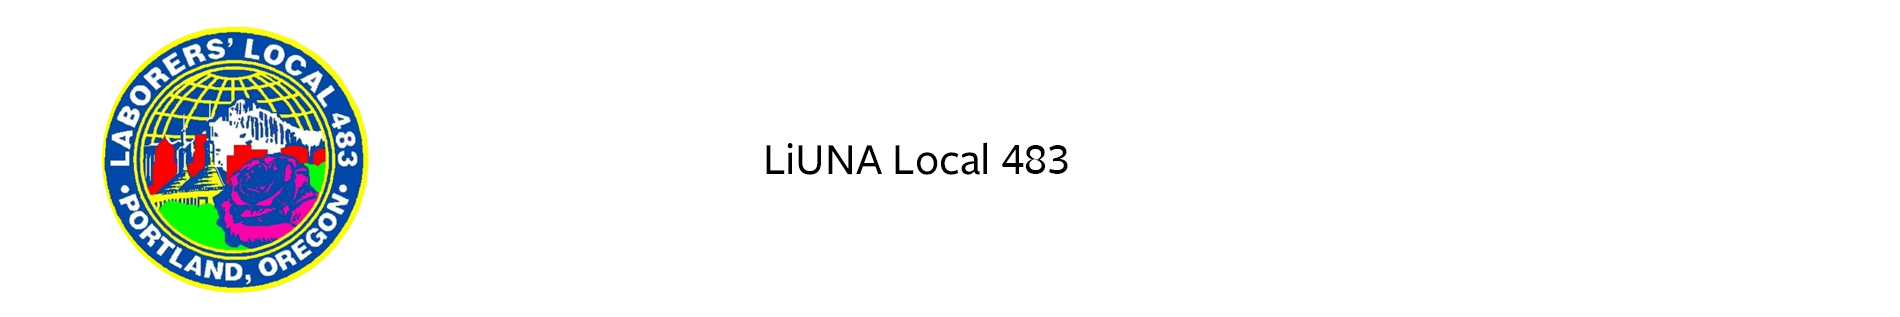 liuna.png